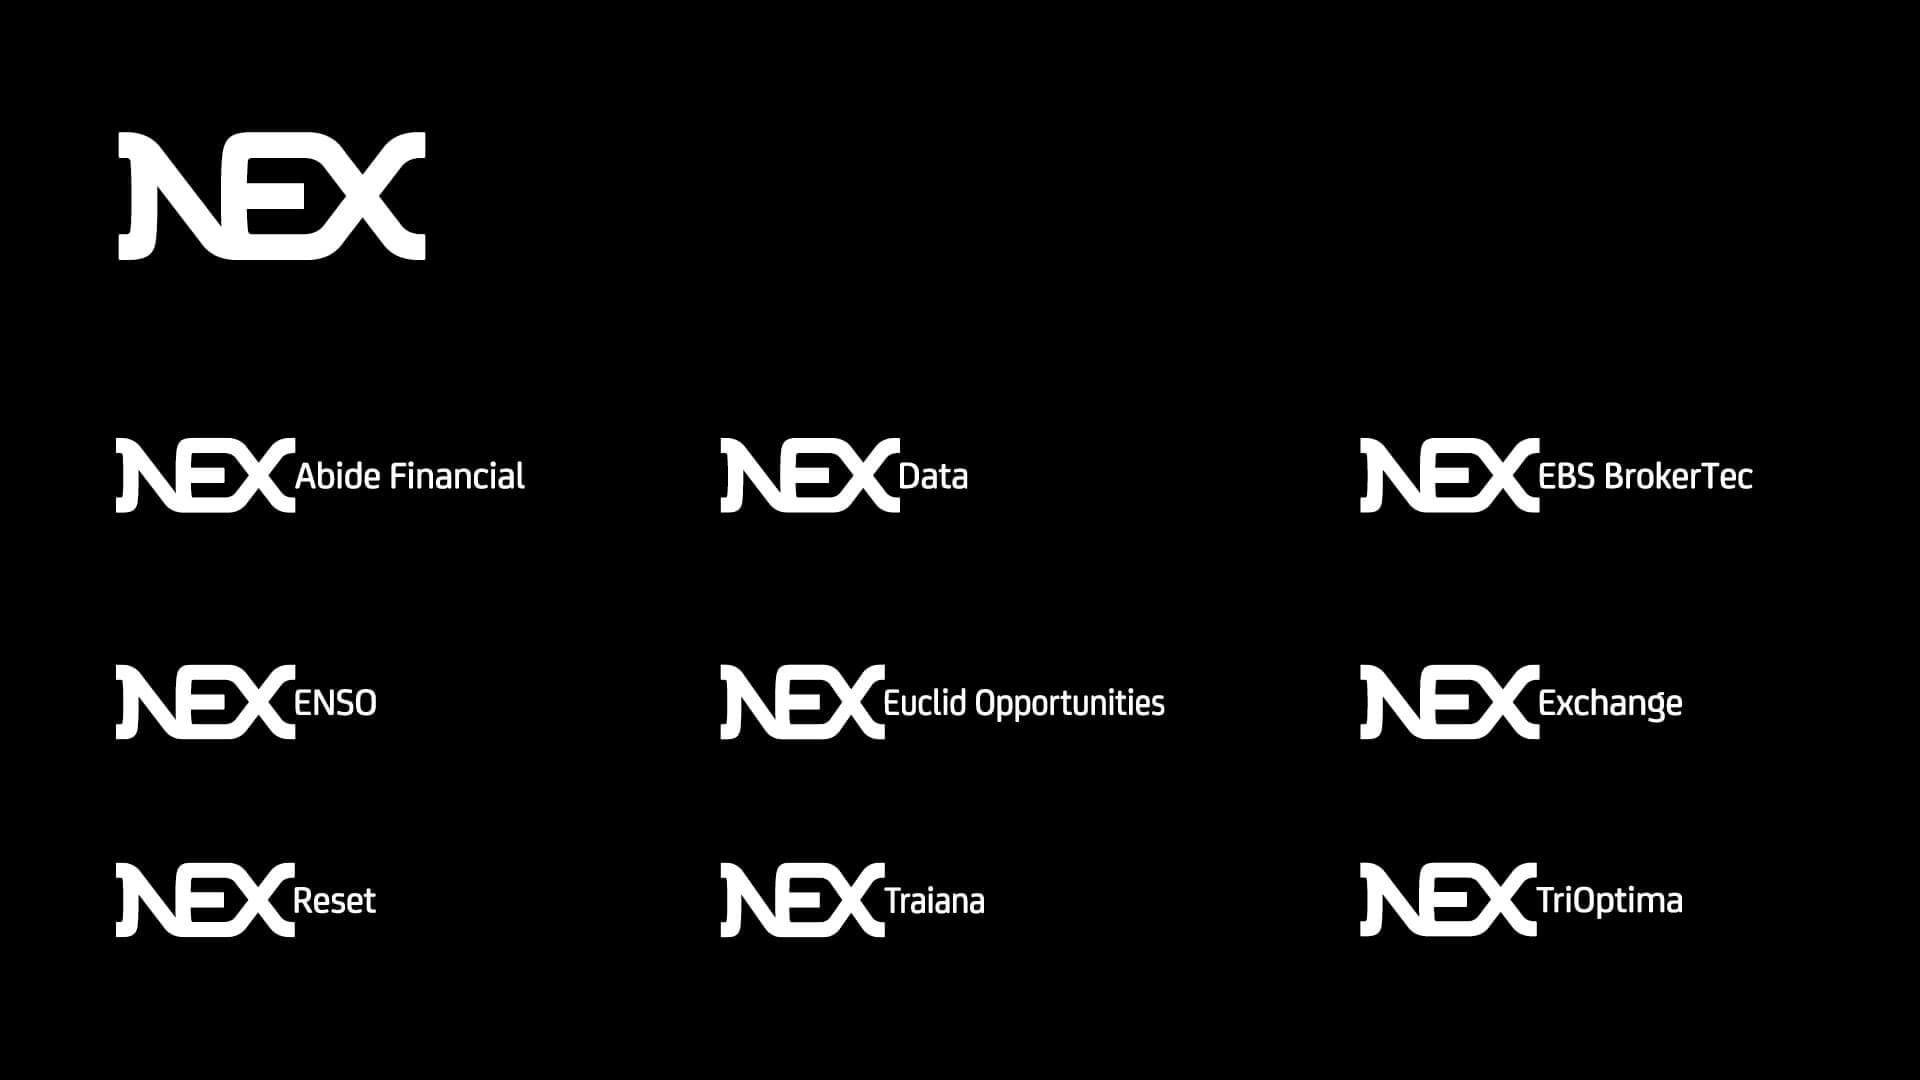 nex brand architecture brand strategy rebranding